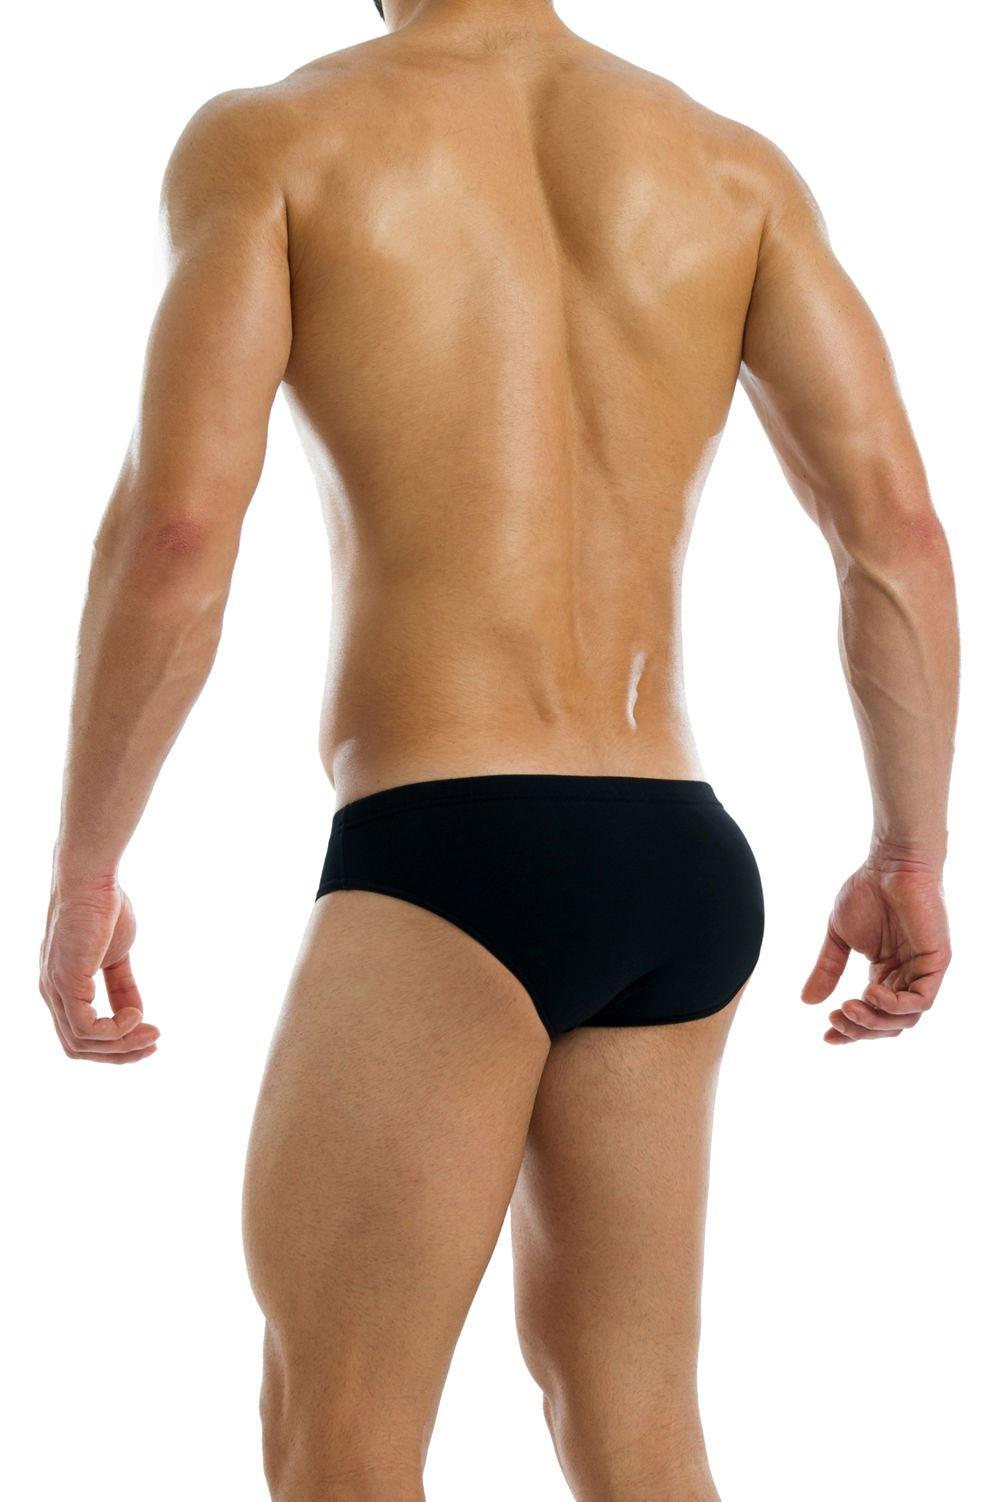 MODUS VIVENDI anti-batterico Breve Pantaloni Designer Biancheria Intima Mutande Moda